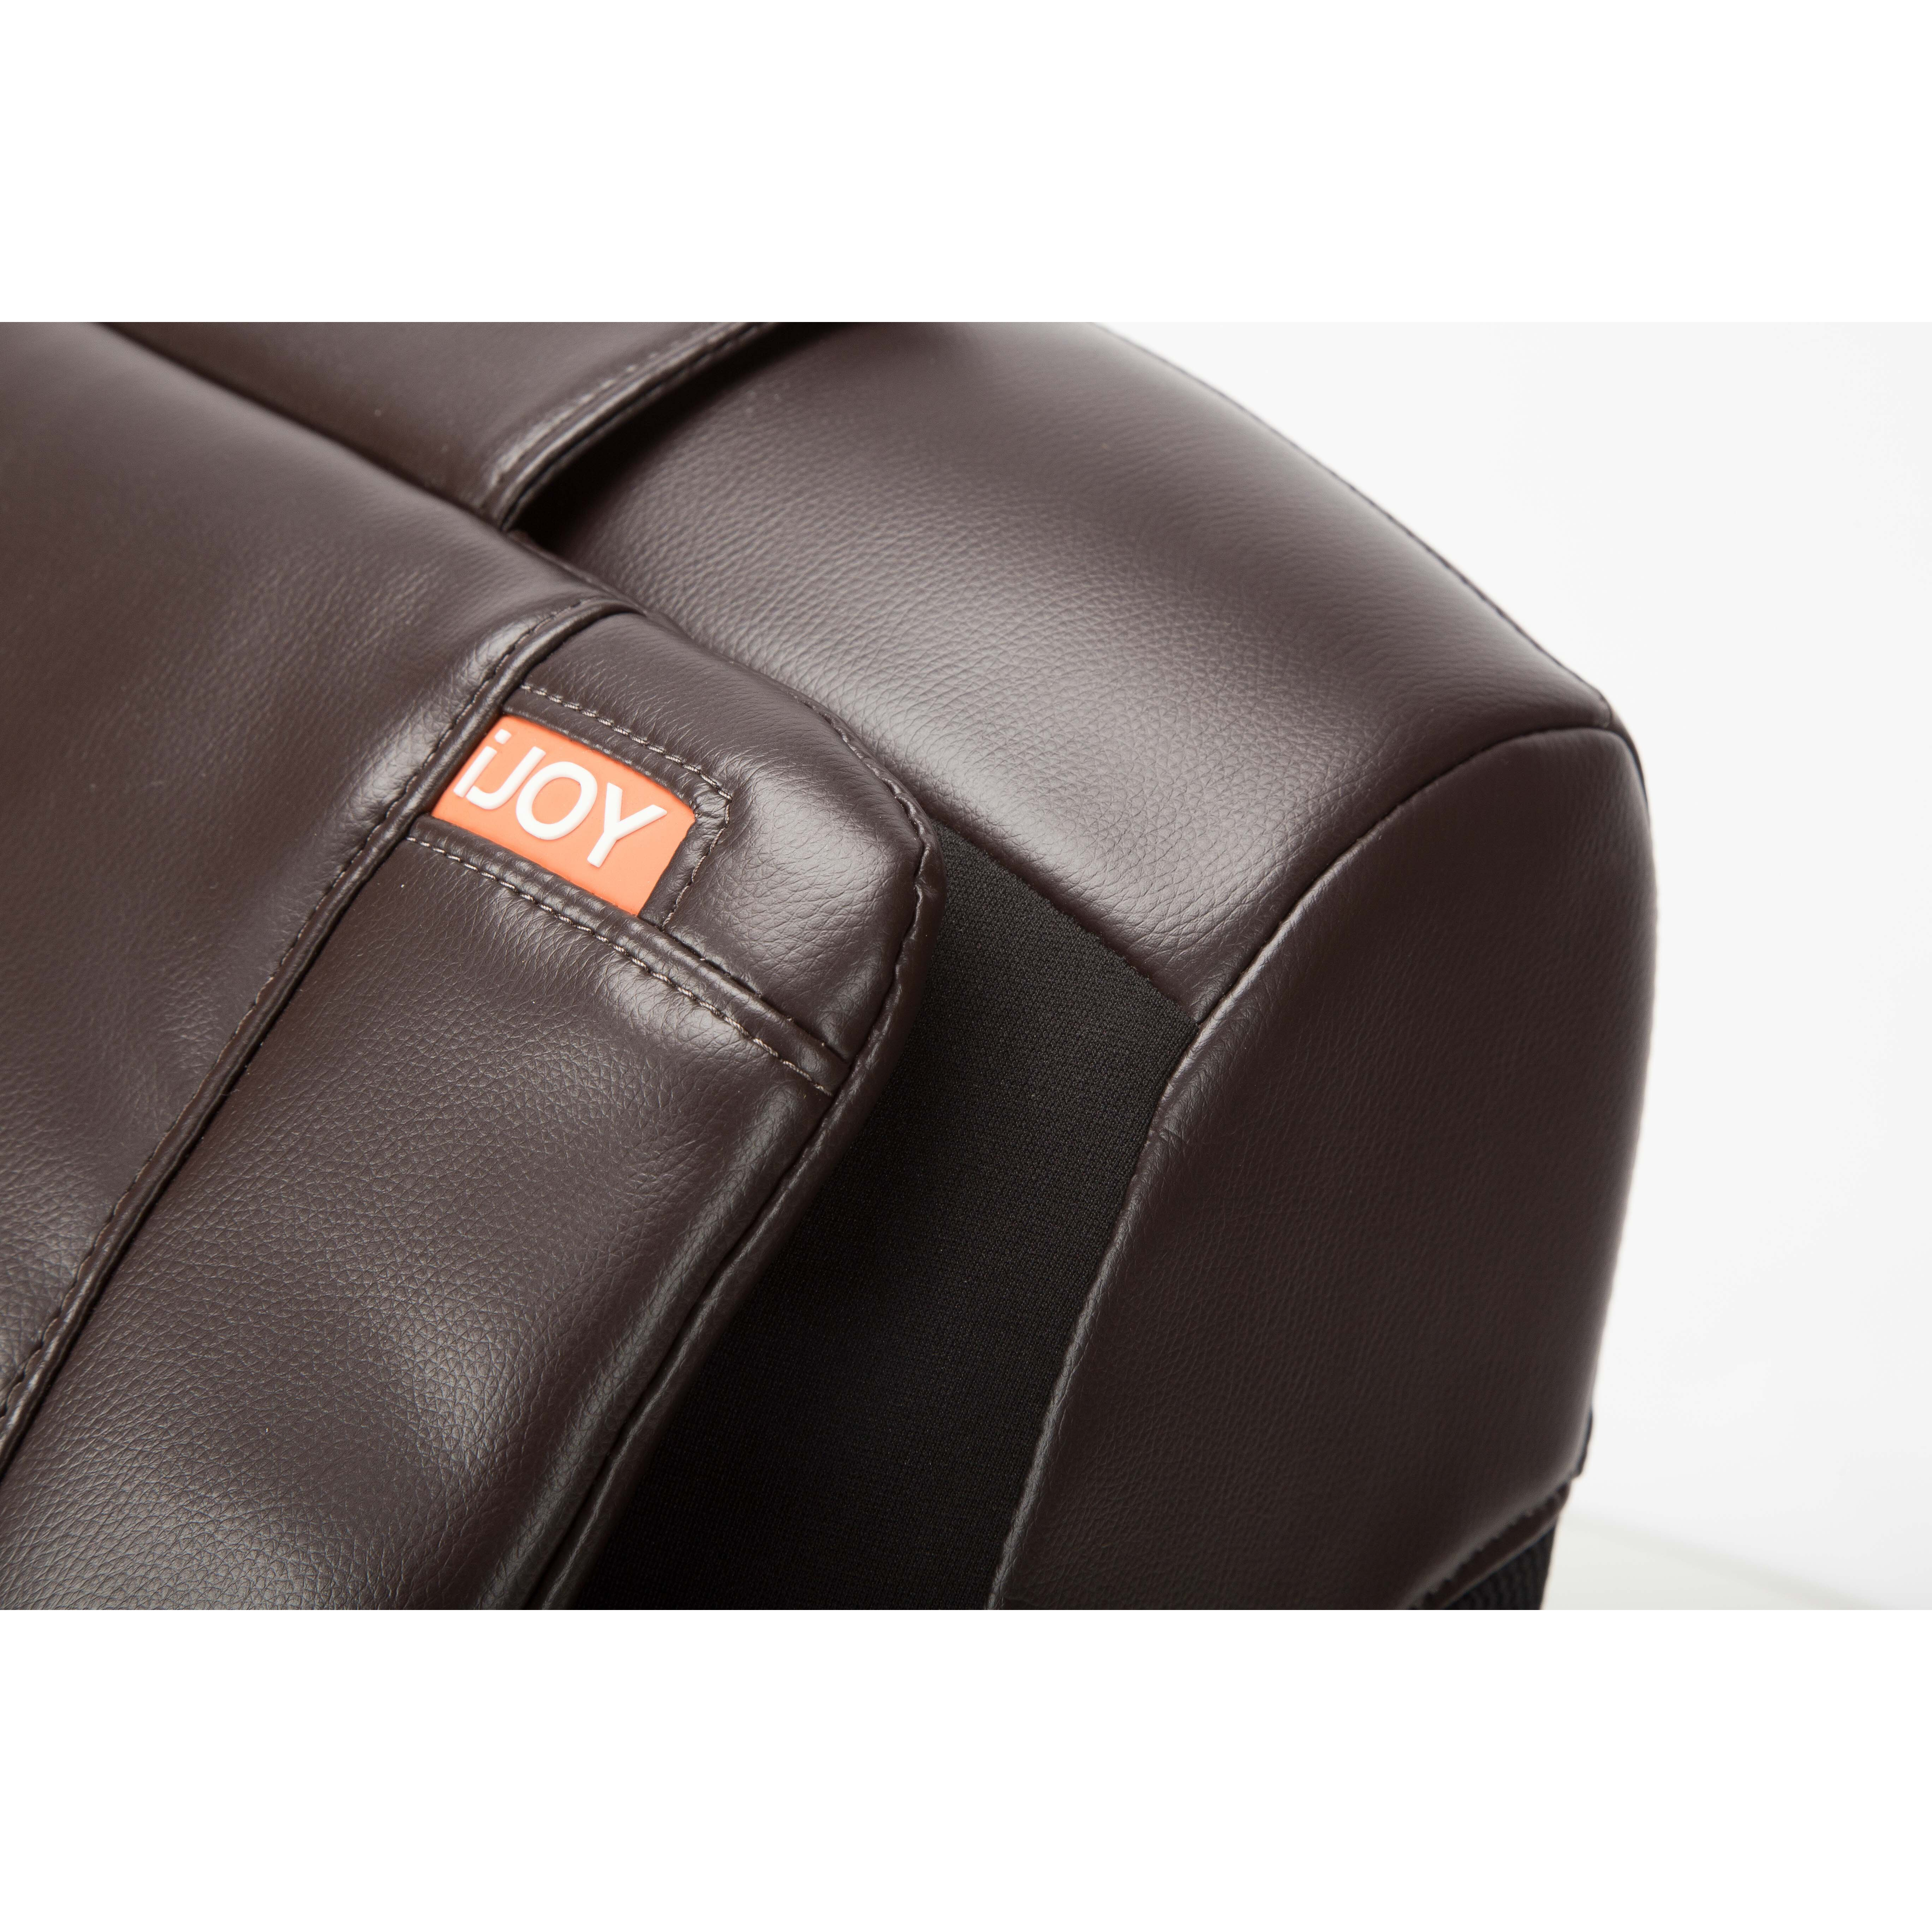 Fresh Ijoy Massage Chair Inspirational